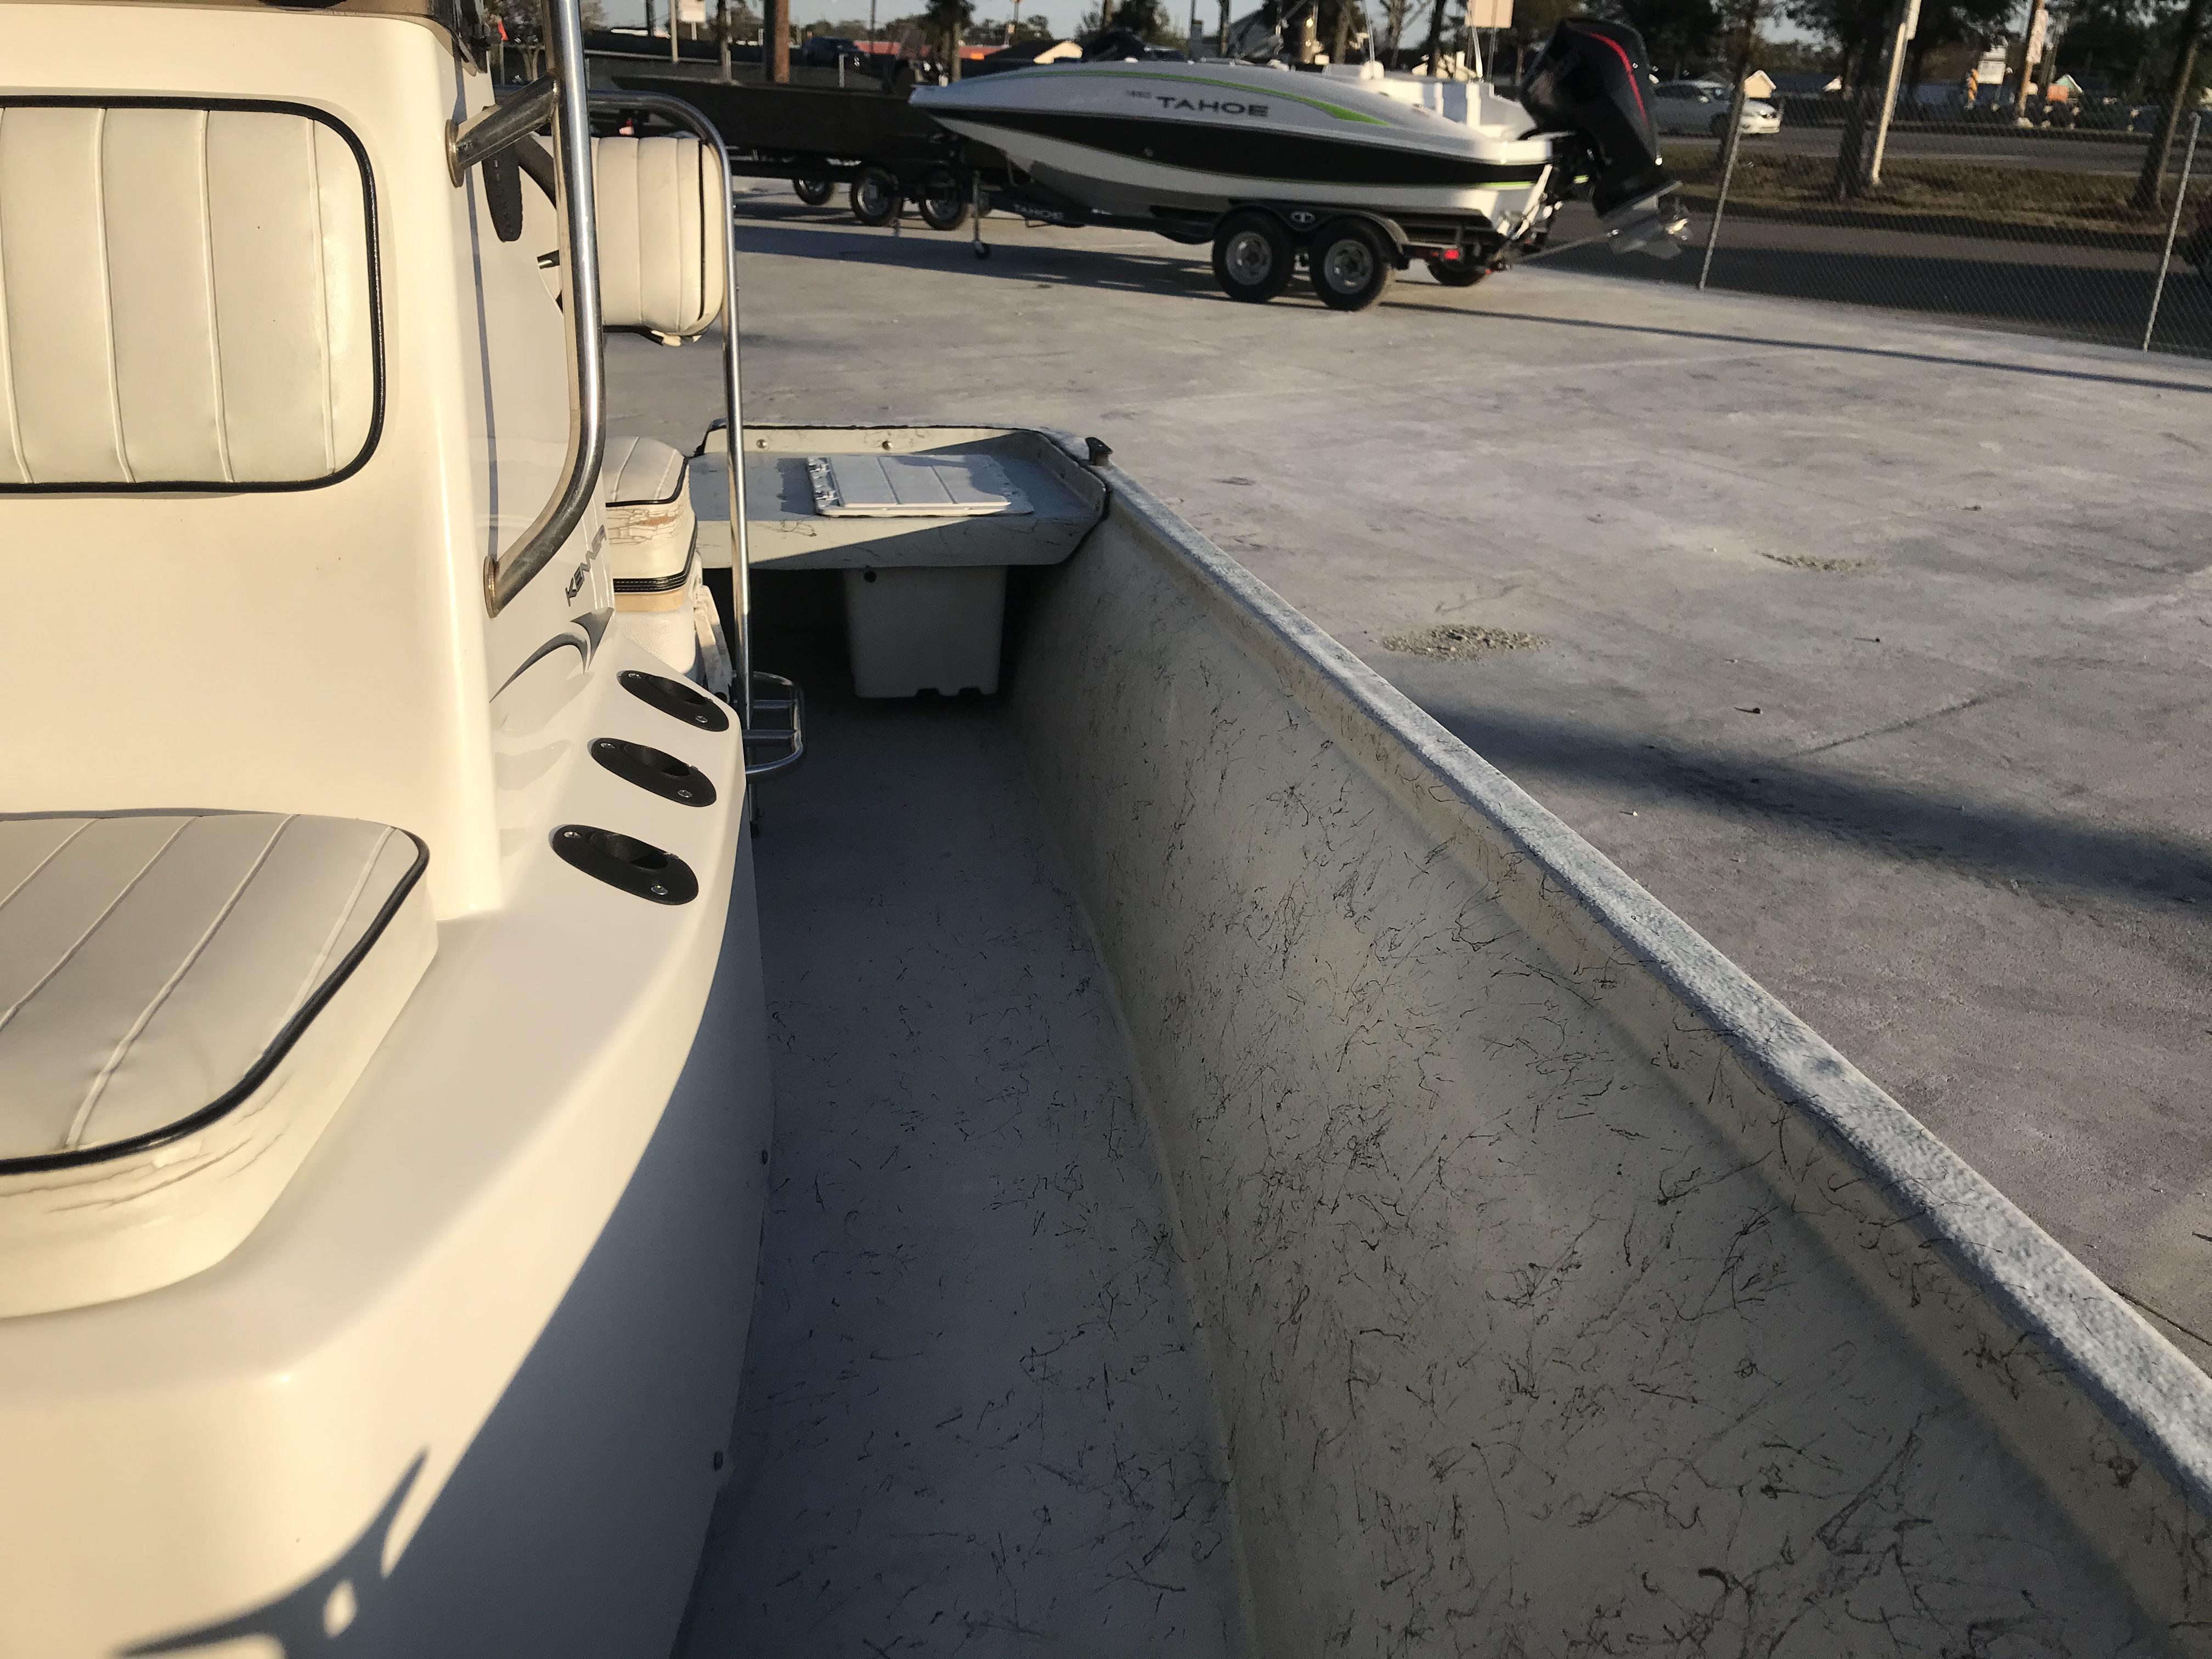 2002 Kenner boat for sale, model of the boat is 180V & Image # 3 of 10